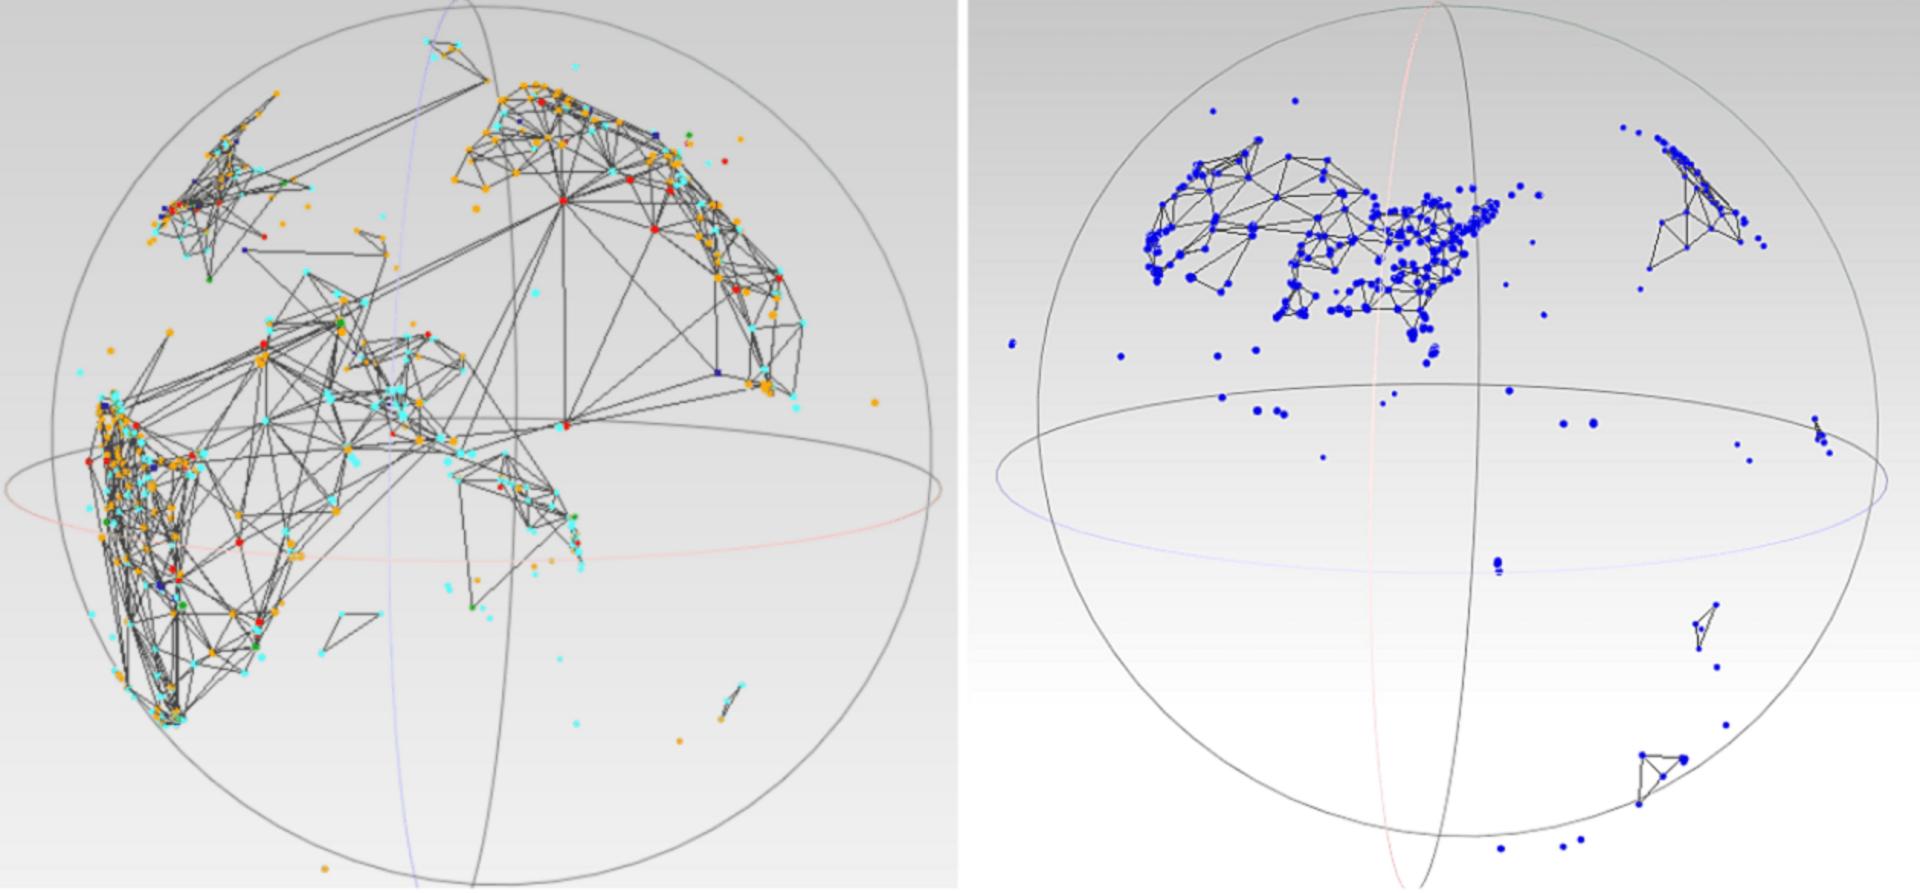 Mycelium mesh, a visualization of communication networks